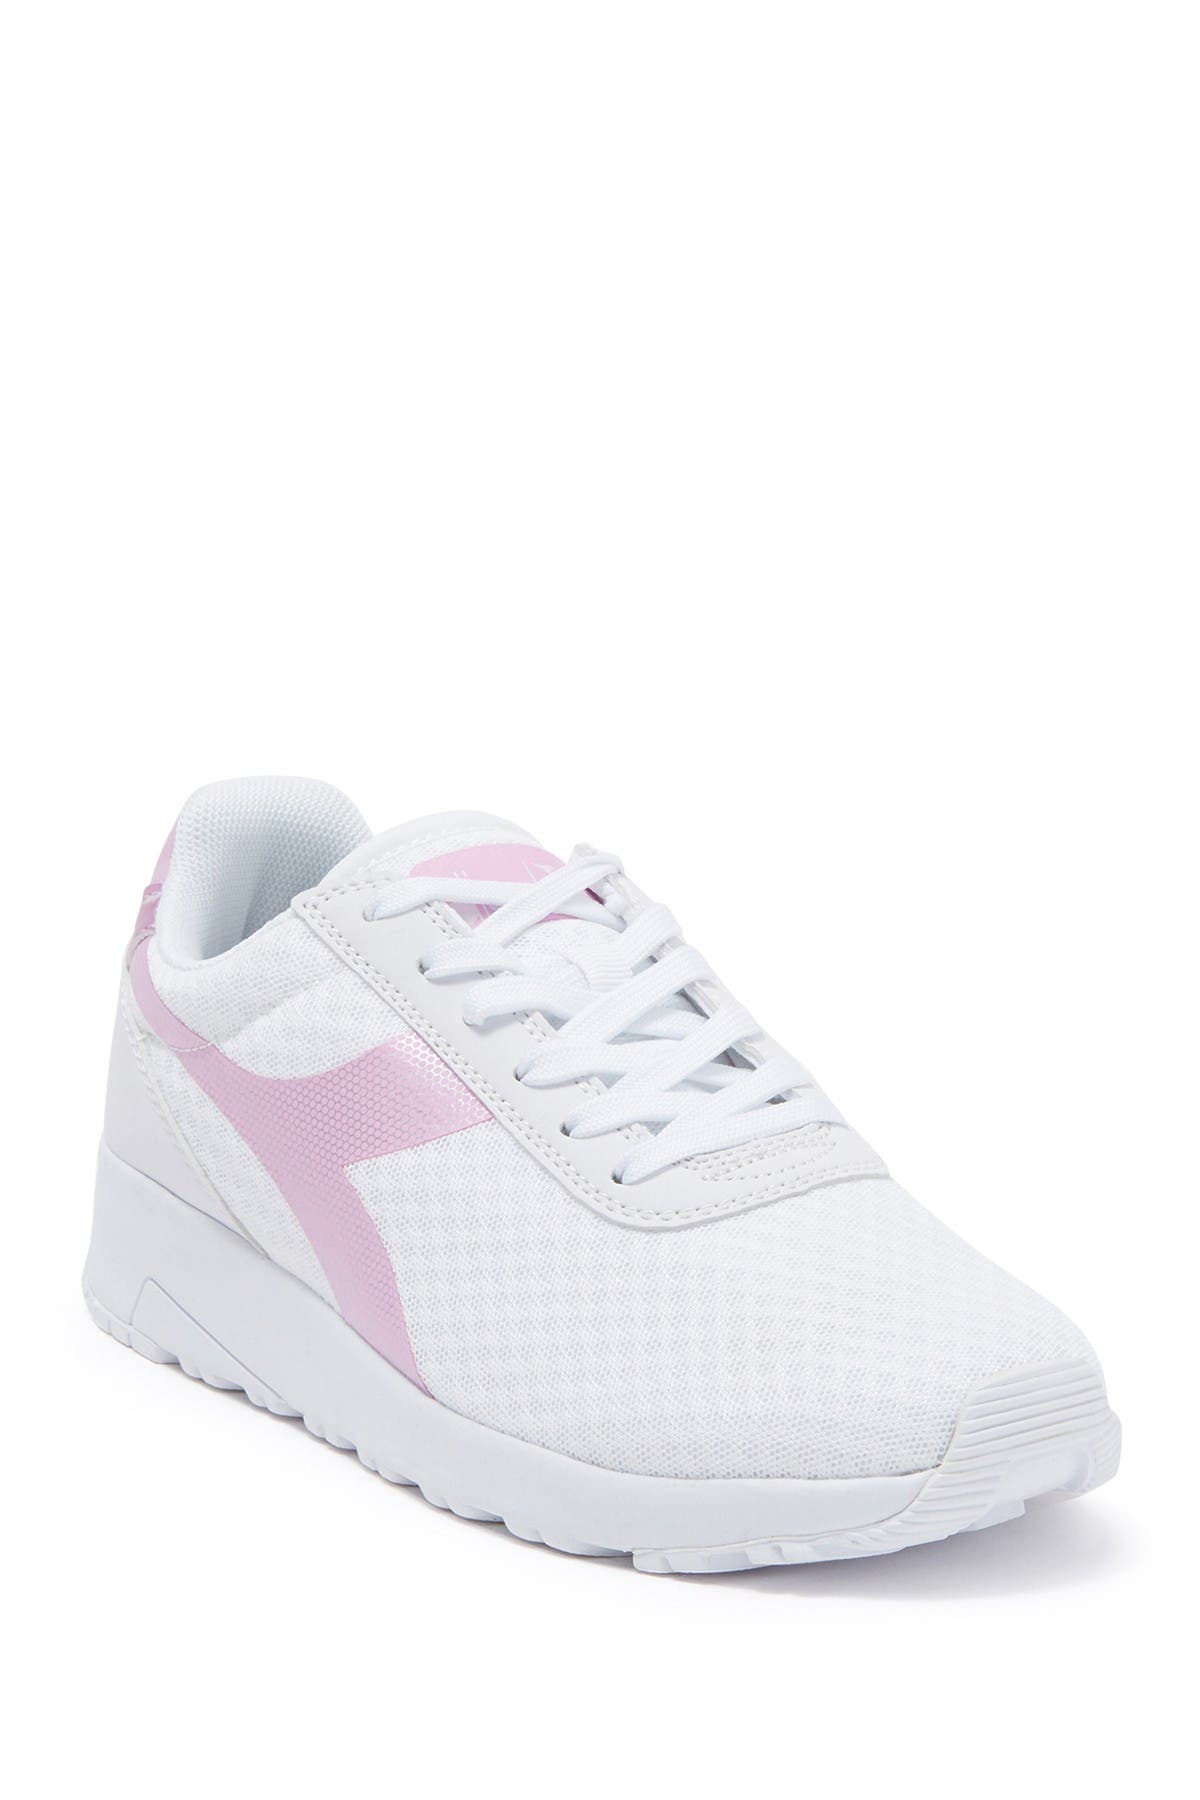 Image of Diadora Evo Running DD Nylon Sneaker